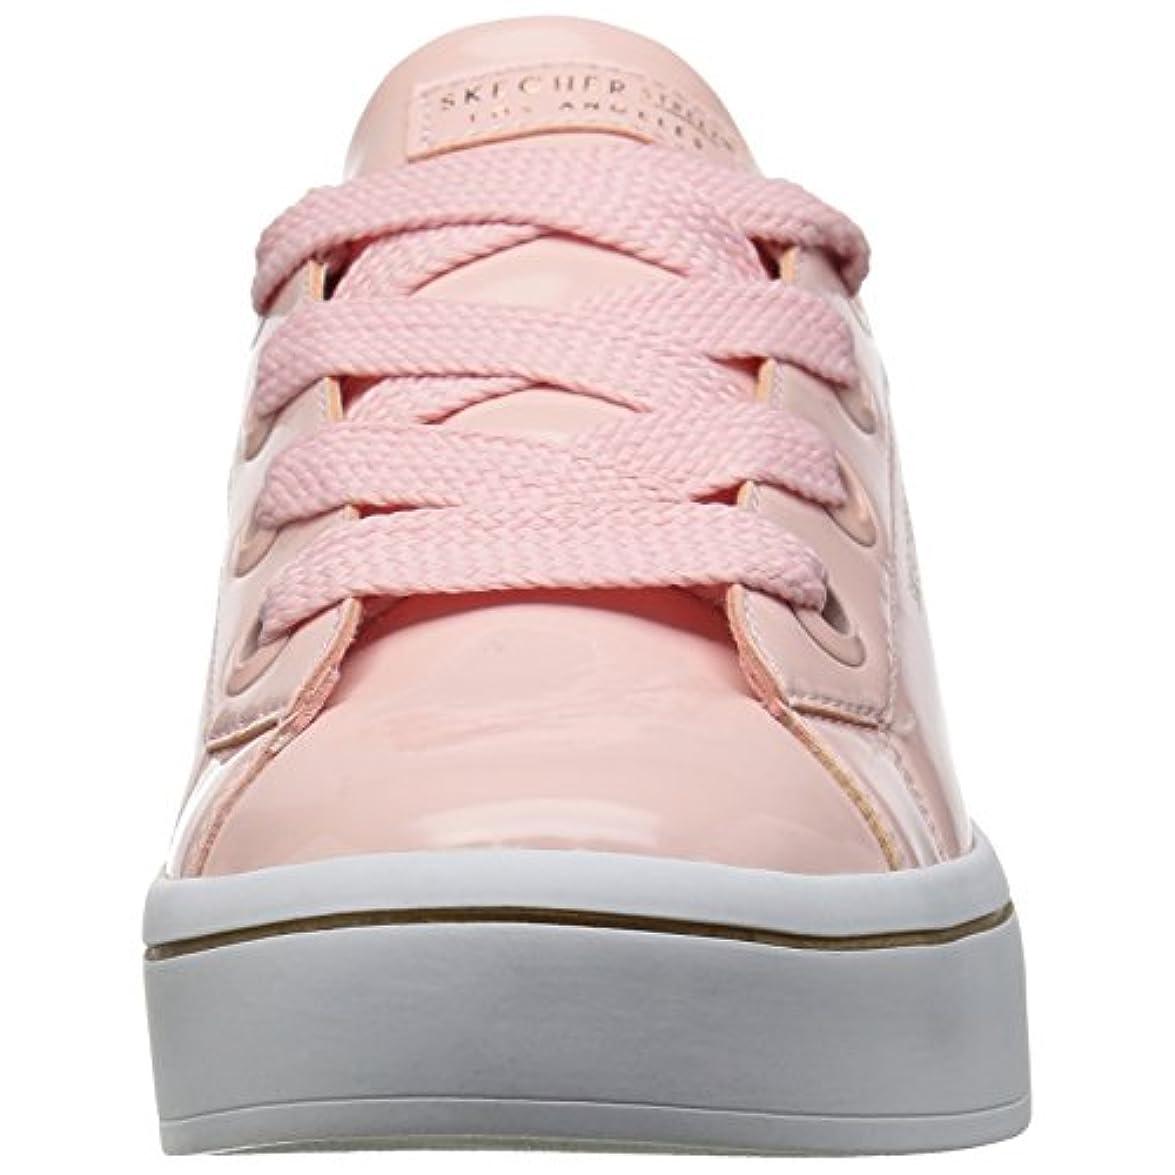 Skechers 959 Sneakers Donna